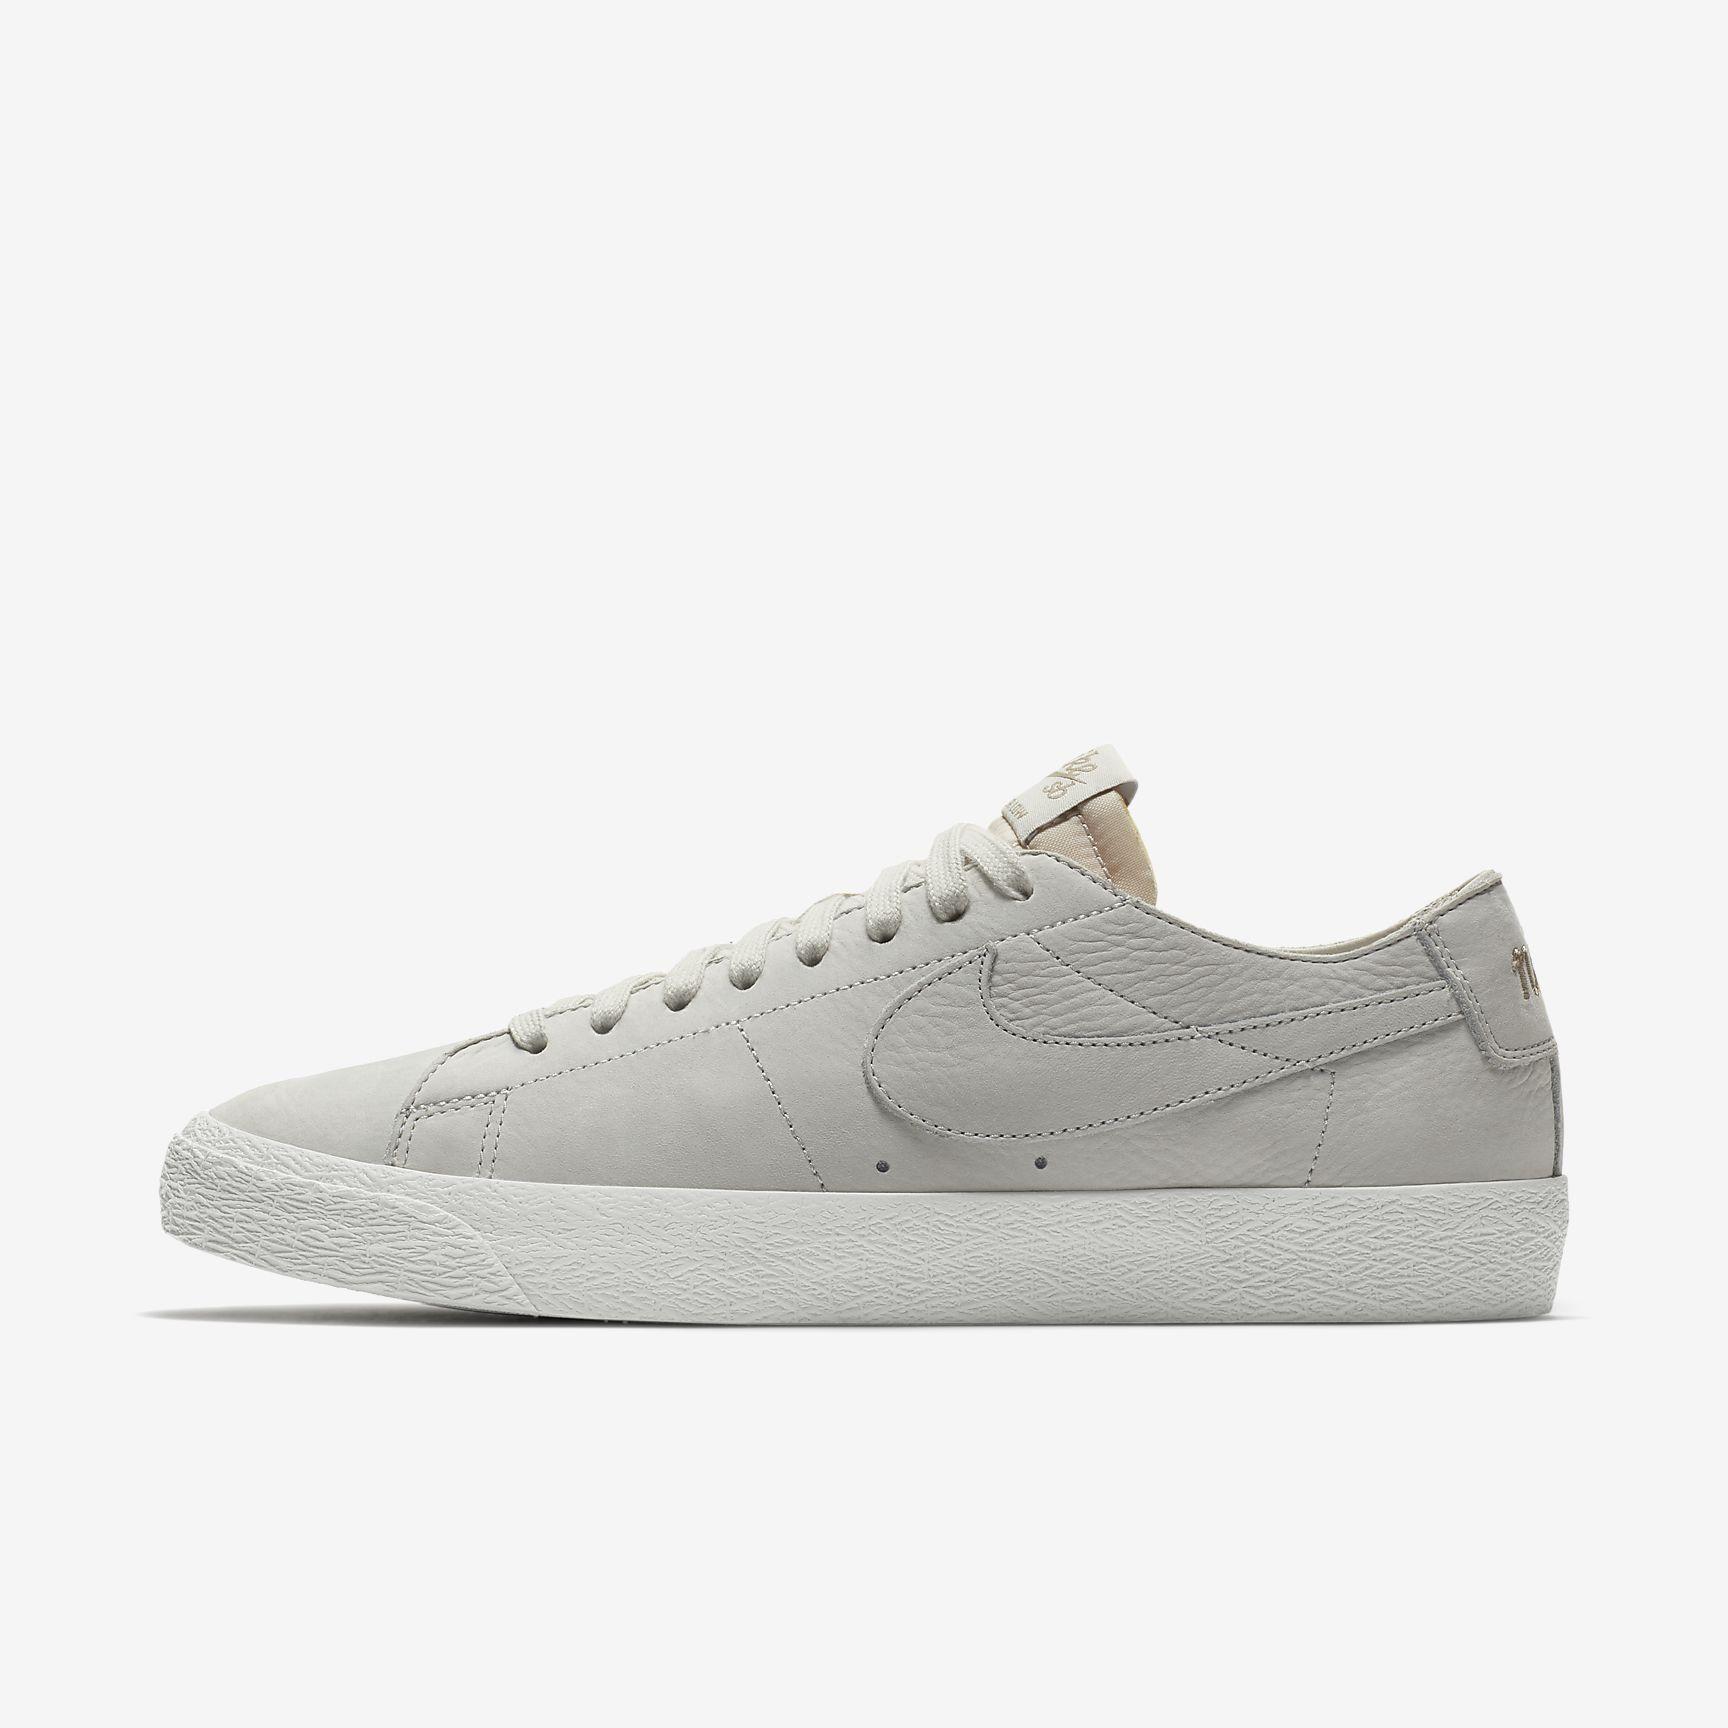 c5b2cd4700c9 Nike SB Zoom Blazer Low Deconstructed Men s Skateboarding Shoe ...